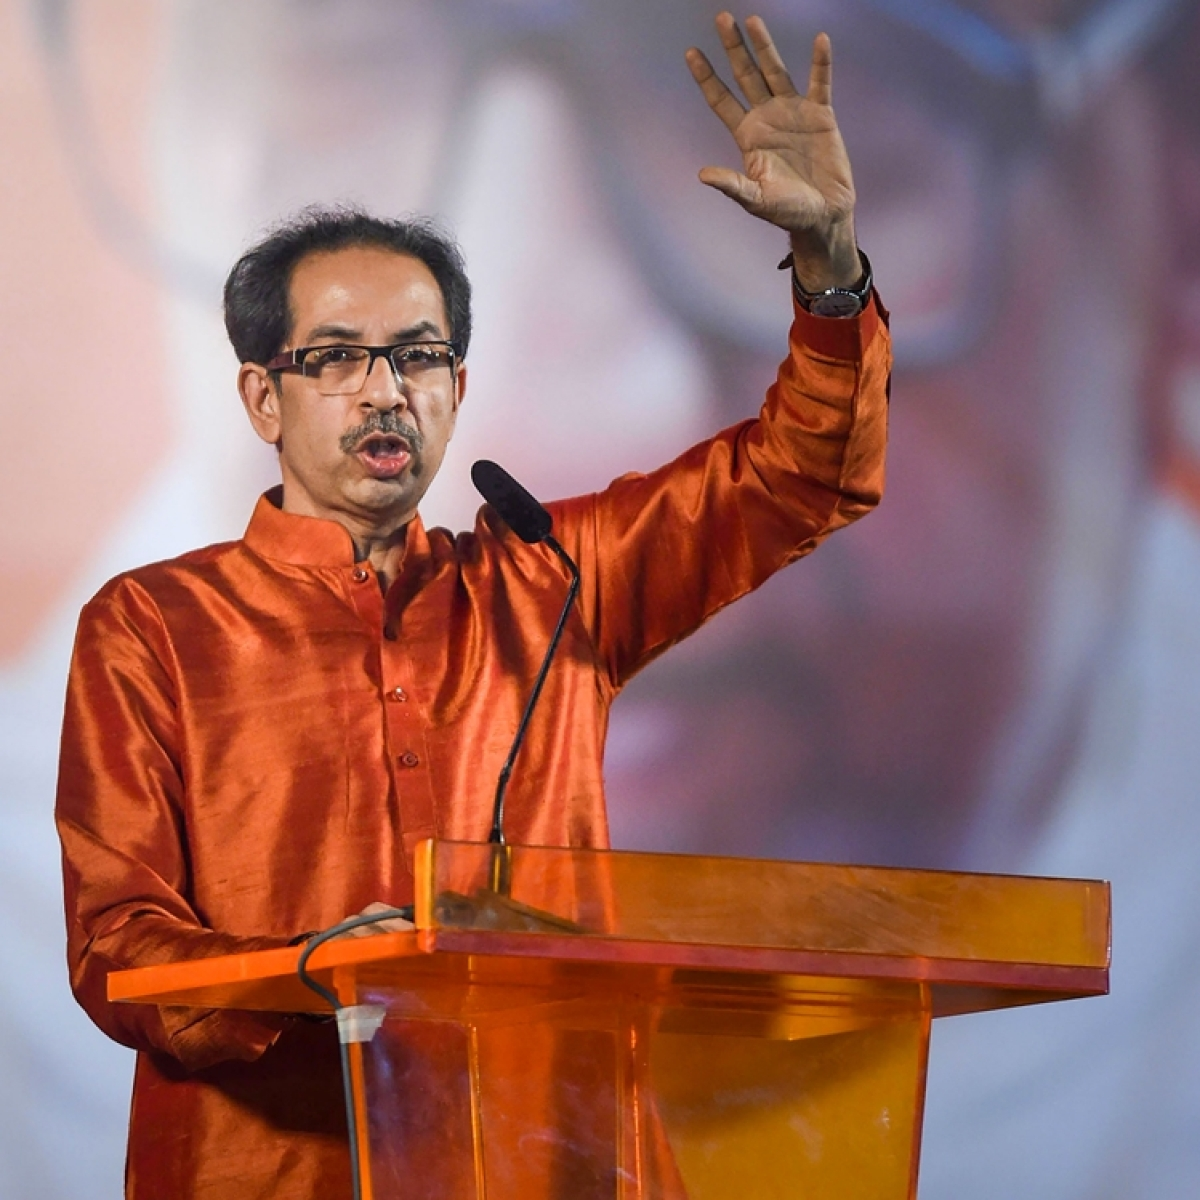 President rule: No fresh petition from Shiv Sena